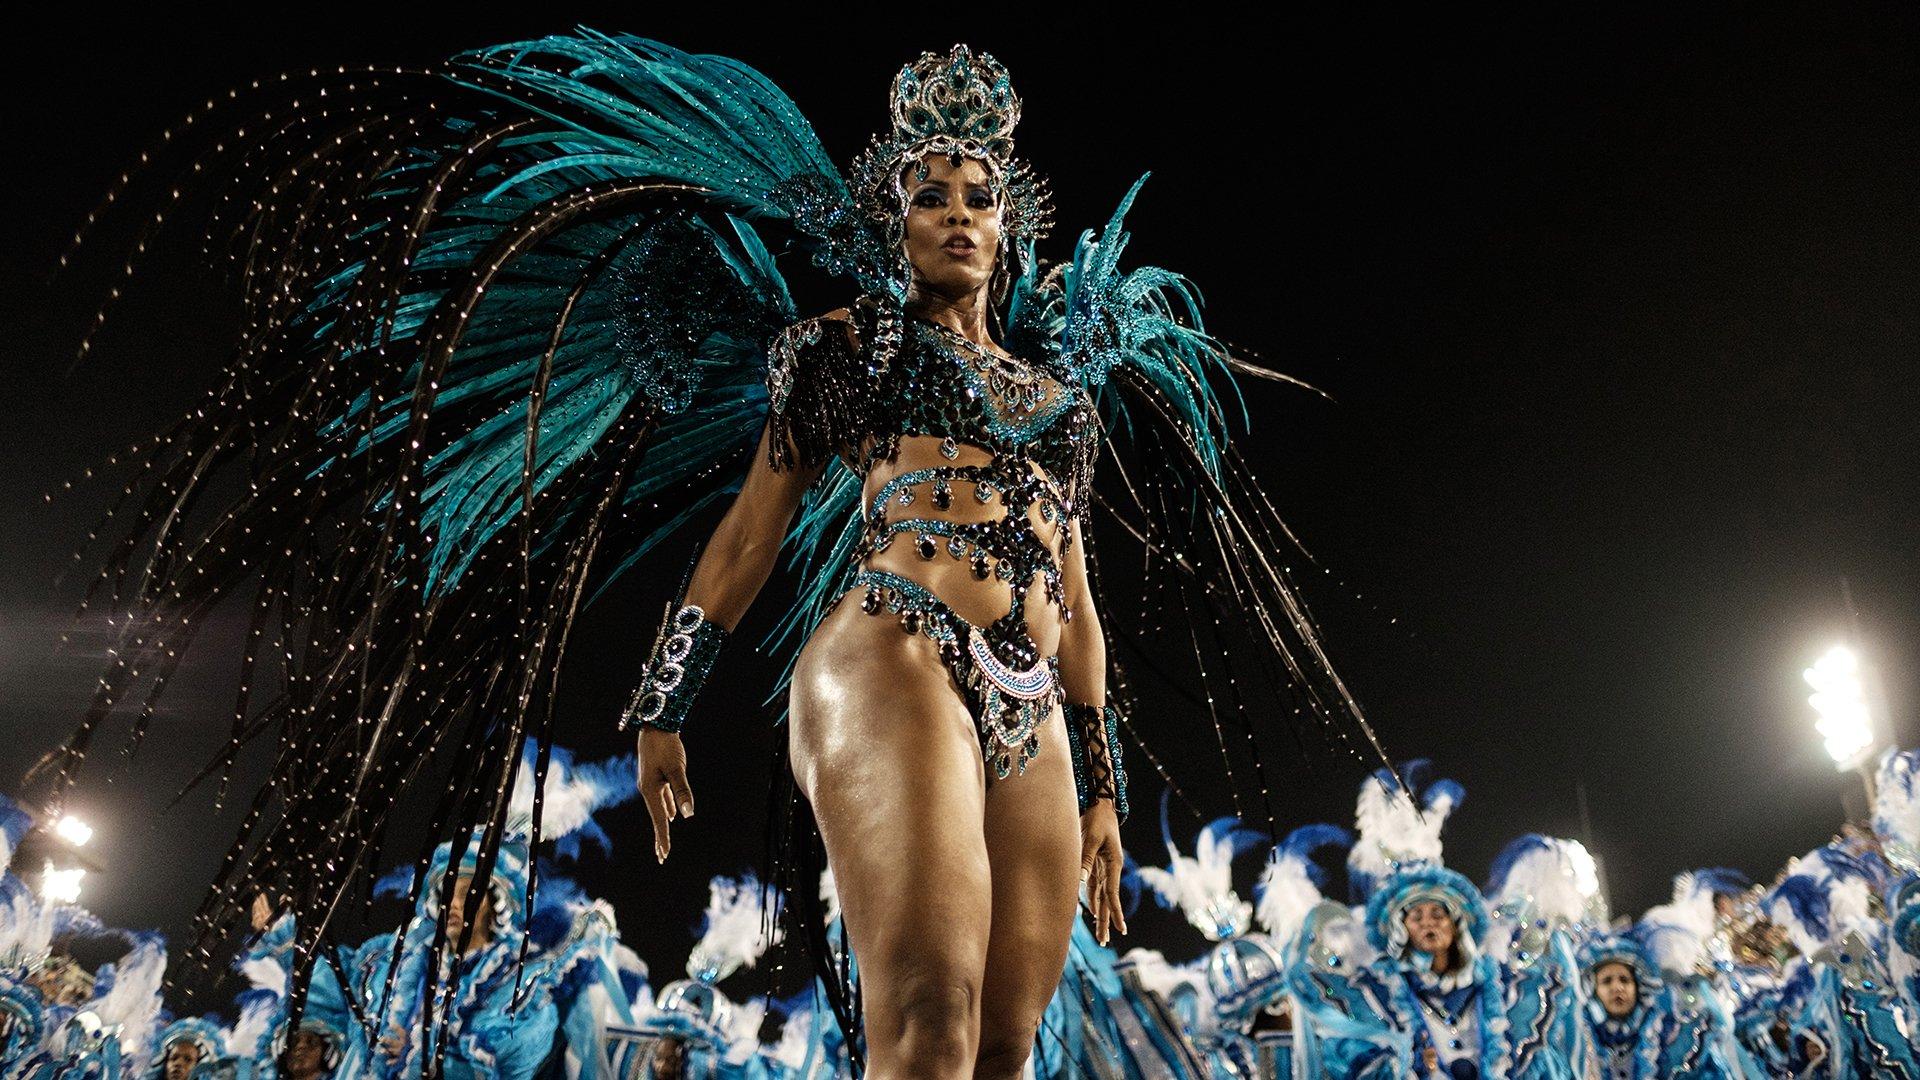 Fotos prohibidas carnaval de rio 2012 61